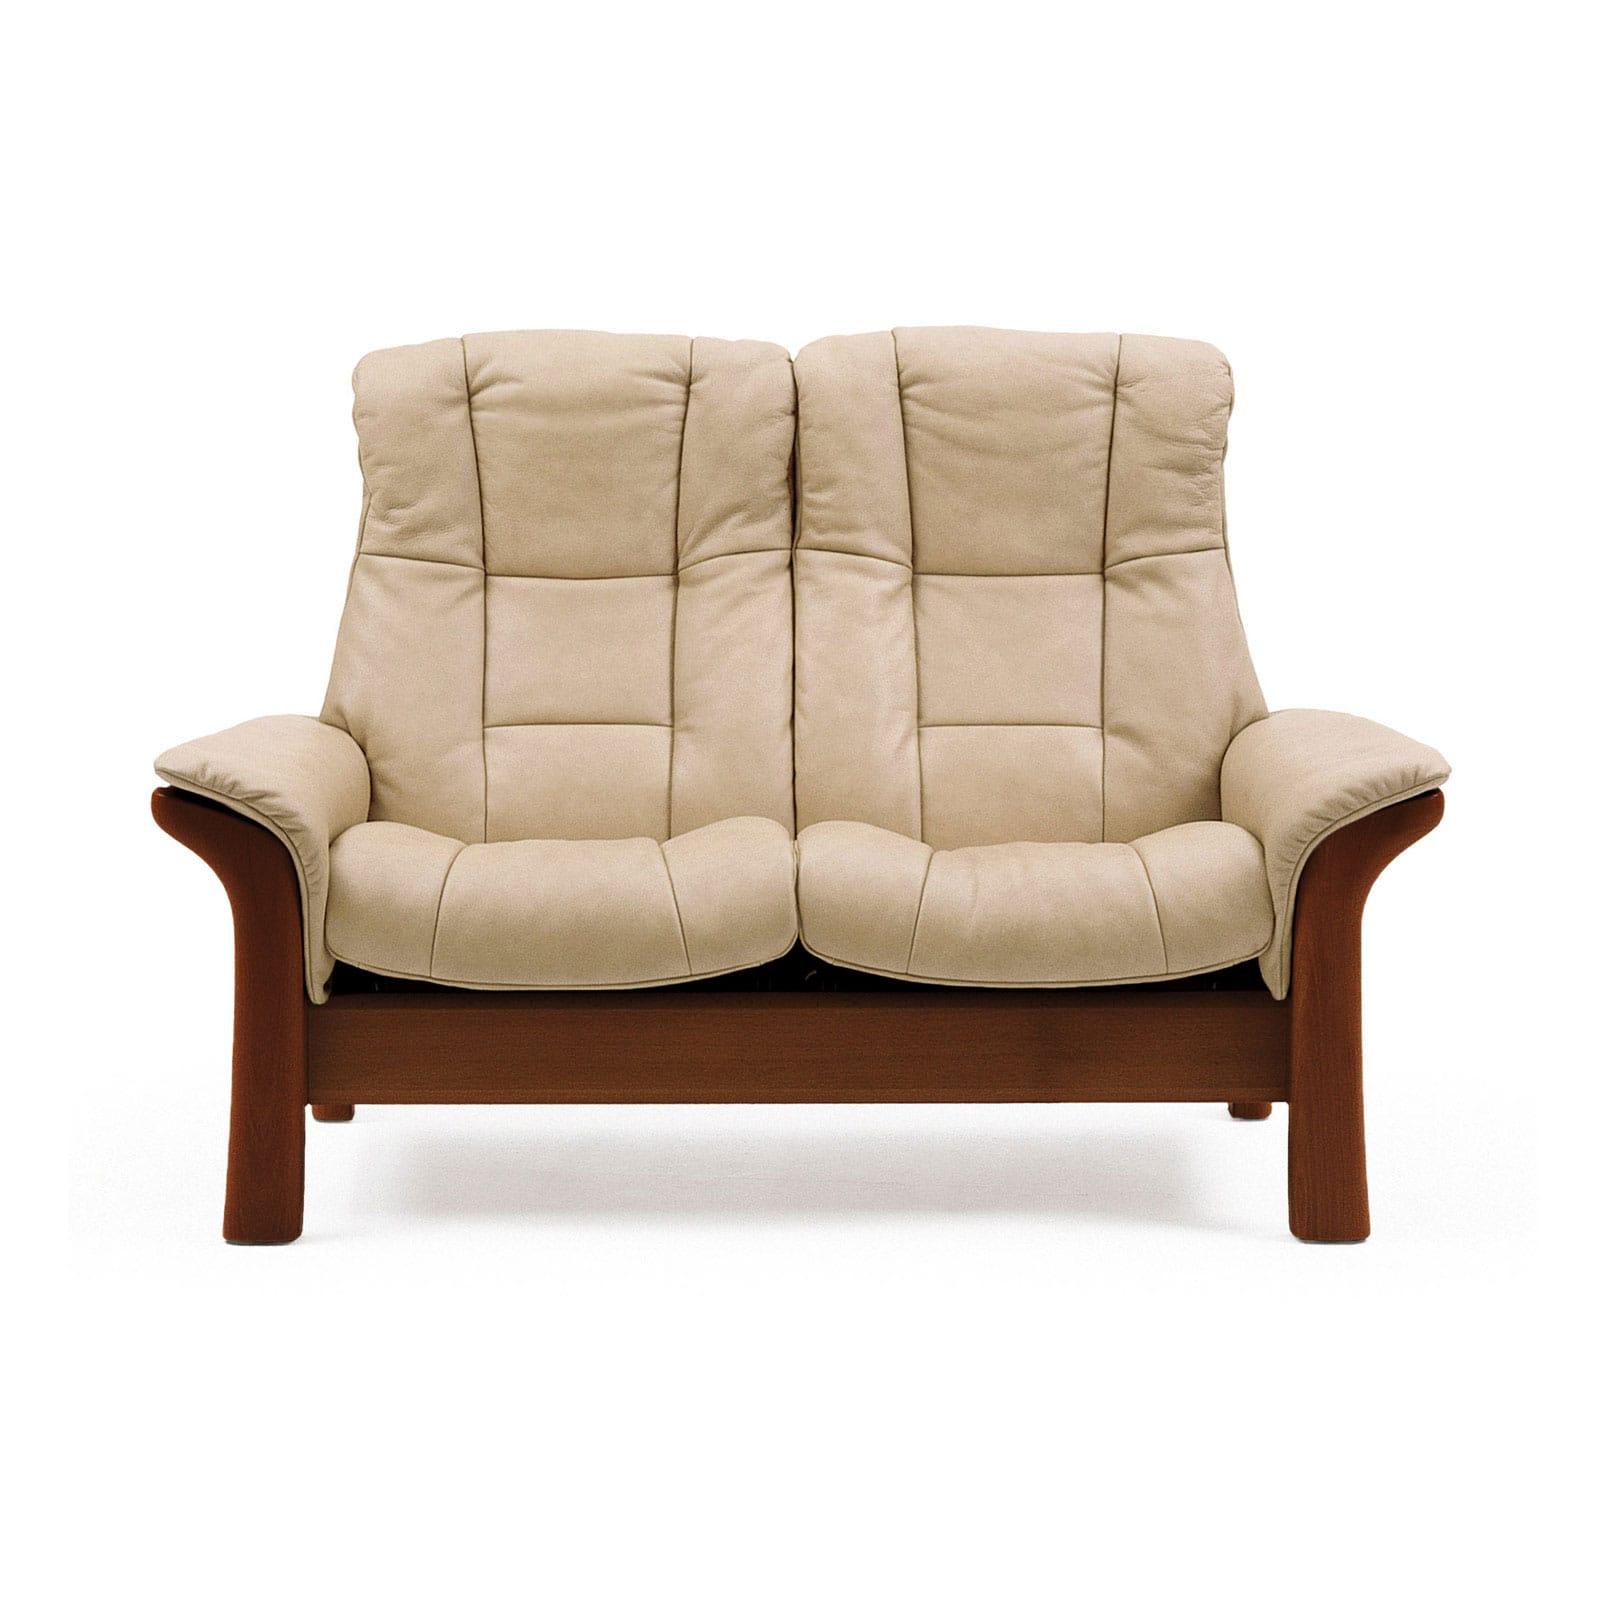 Full Size of 2 Sitzer Sofa Stressless Windsor M Big Mit Hocker Impressionen Esstisch Angebote Bett Weiß 120x200 Massiv 180x200 Liege Petrol Ektorp Bezug Ecksofa Sofa 2 Sitzer Sofa